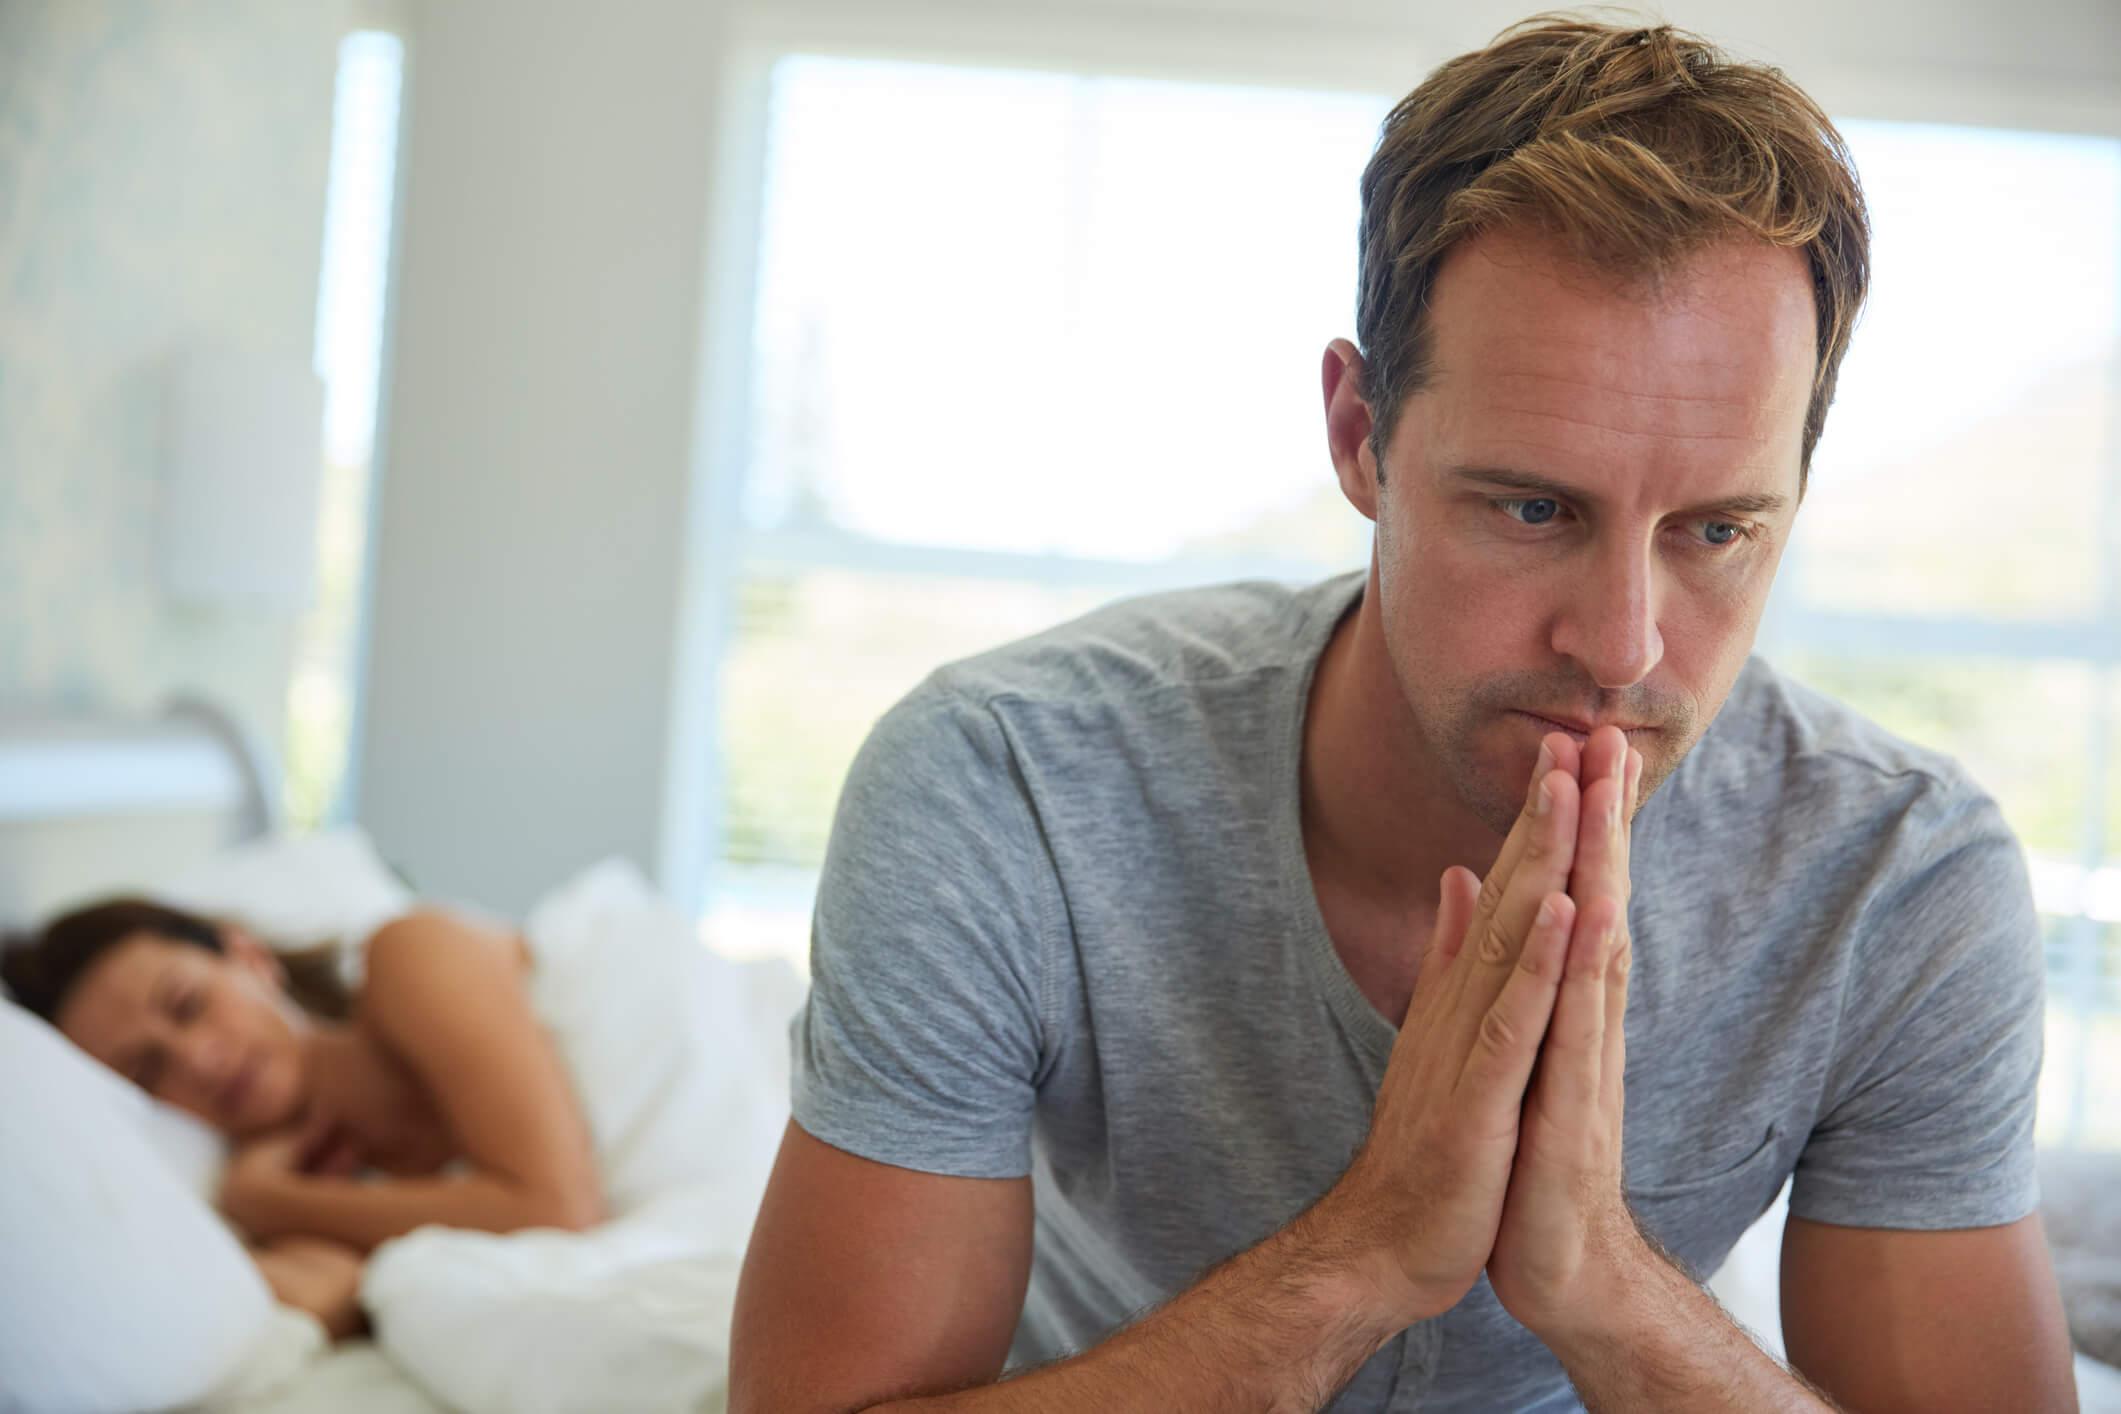 Fisioterapia nas Disfunções Sexuais: como a tecnologia pode ajudar?